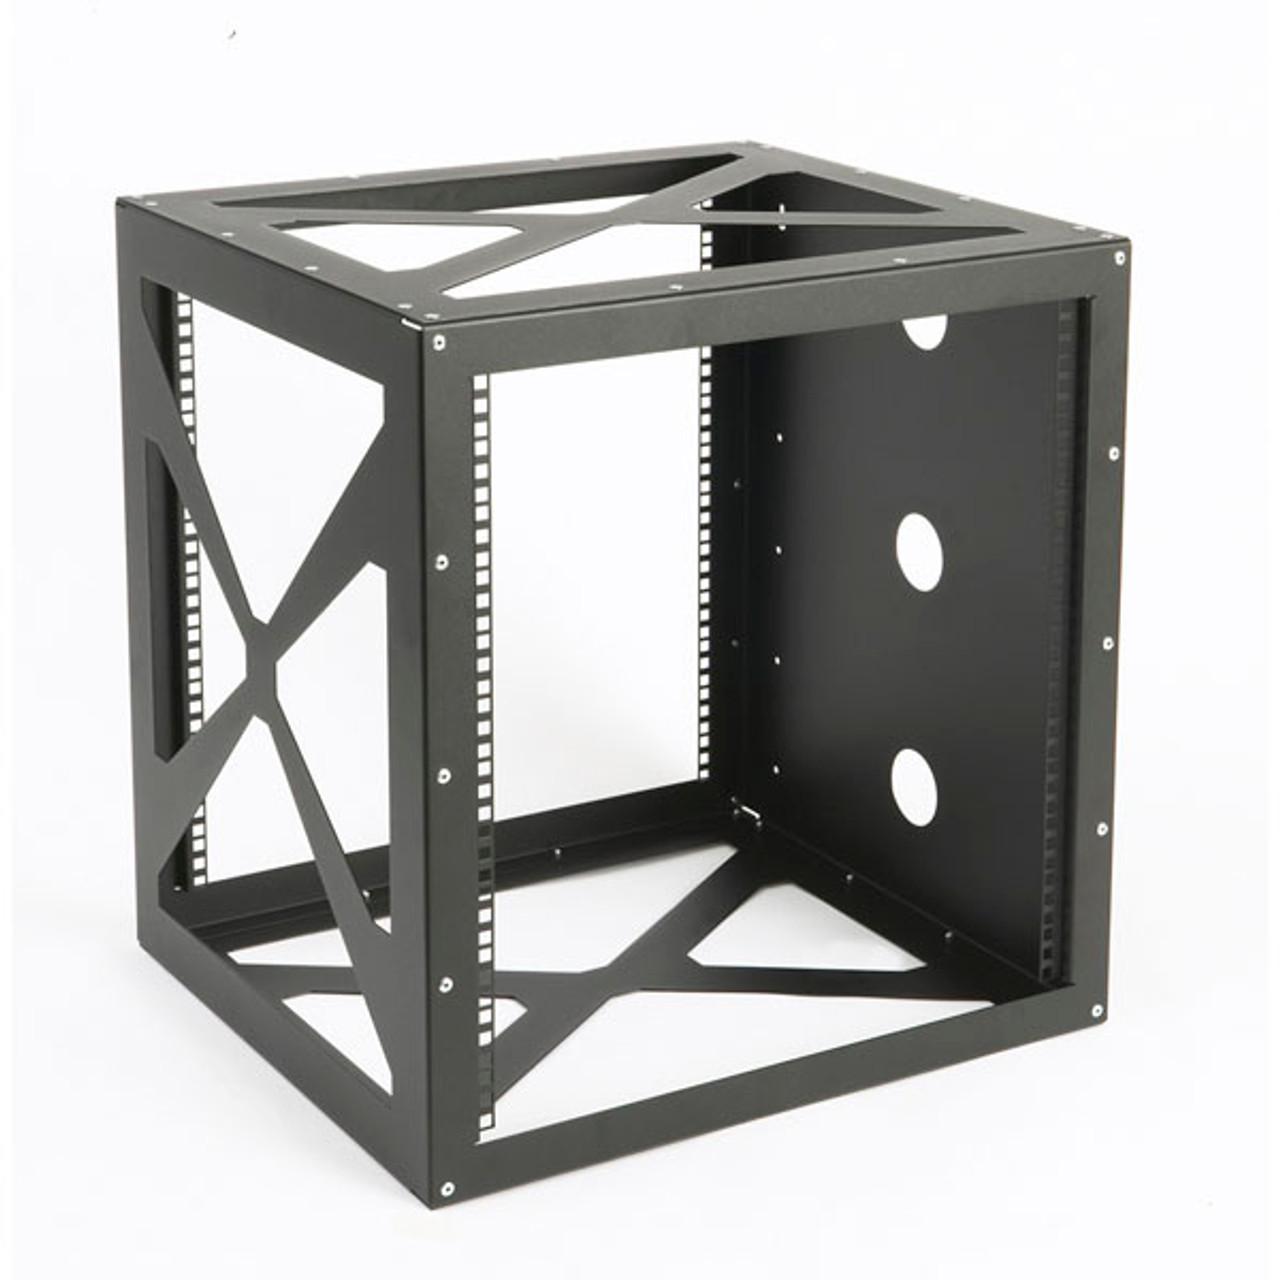 12u side mount rack